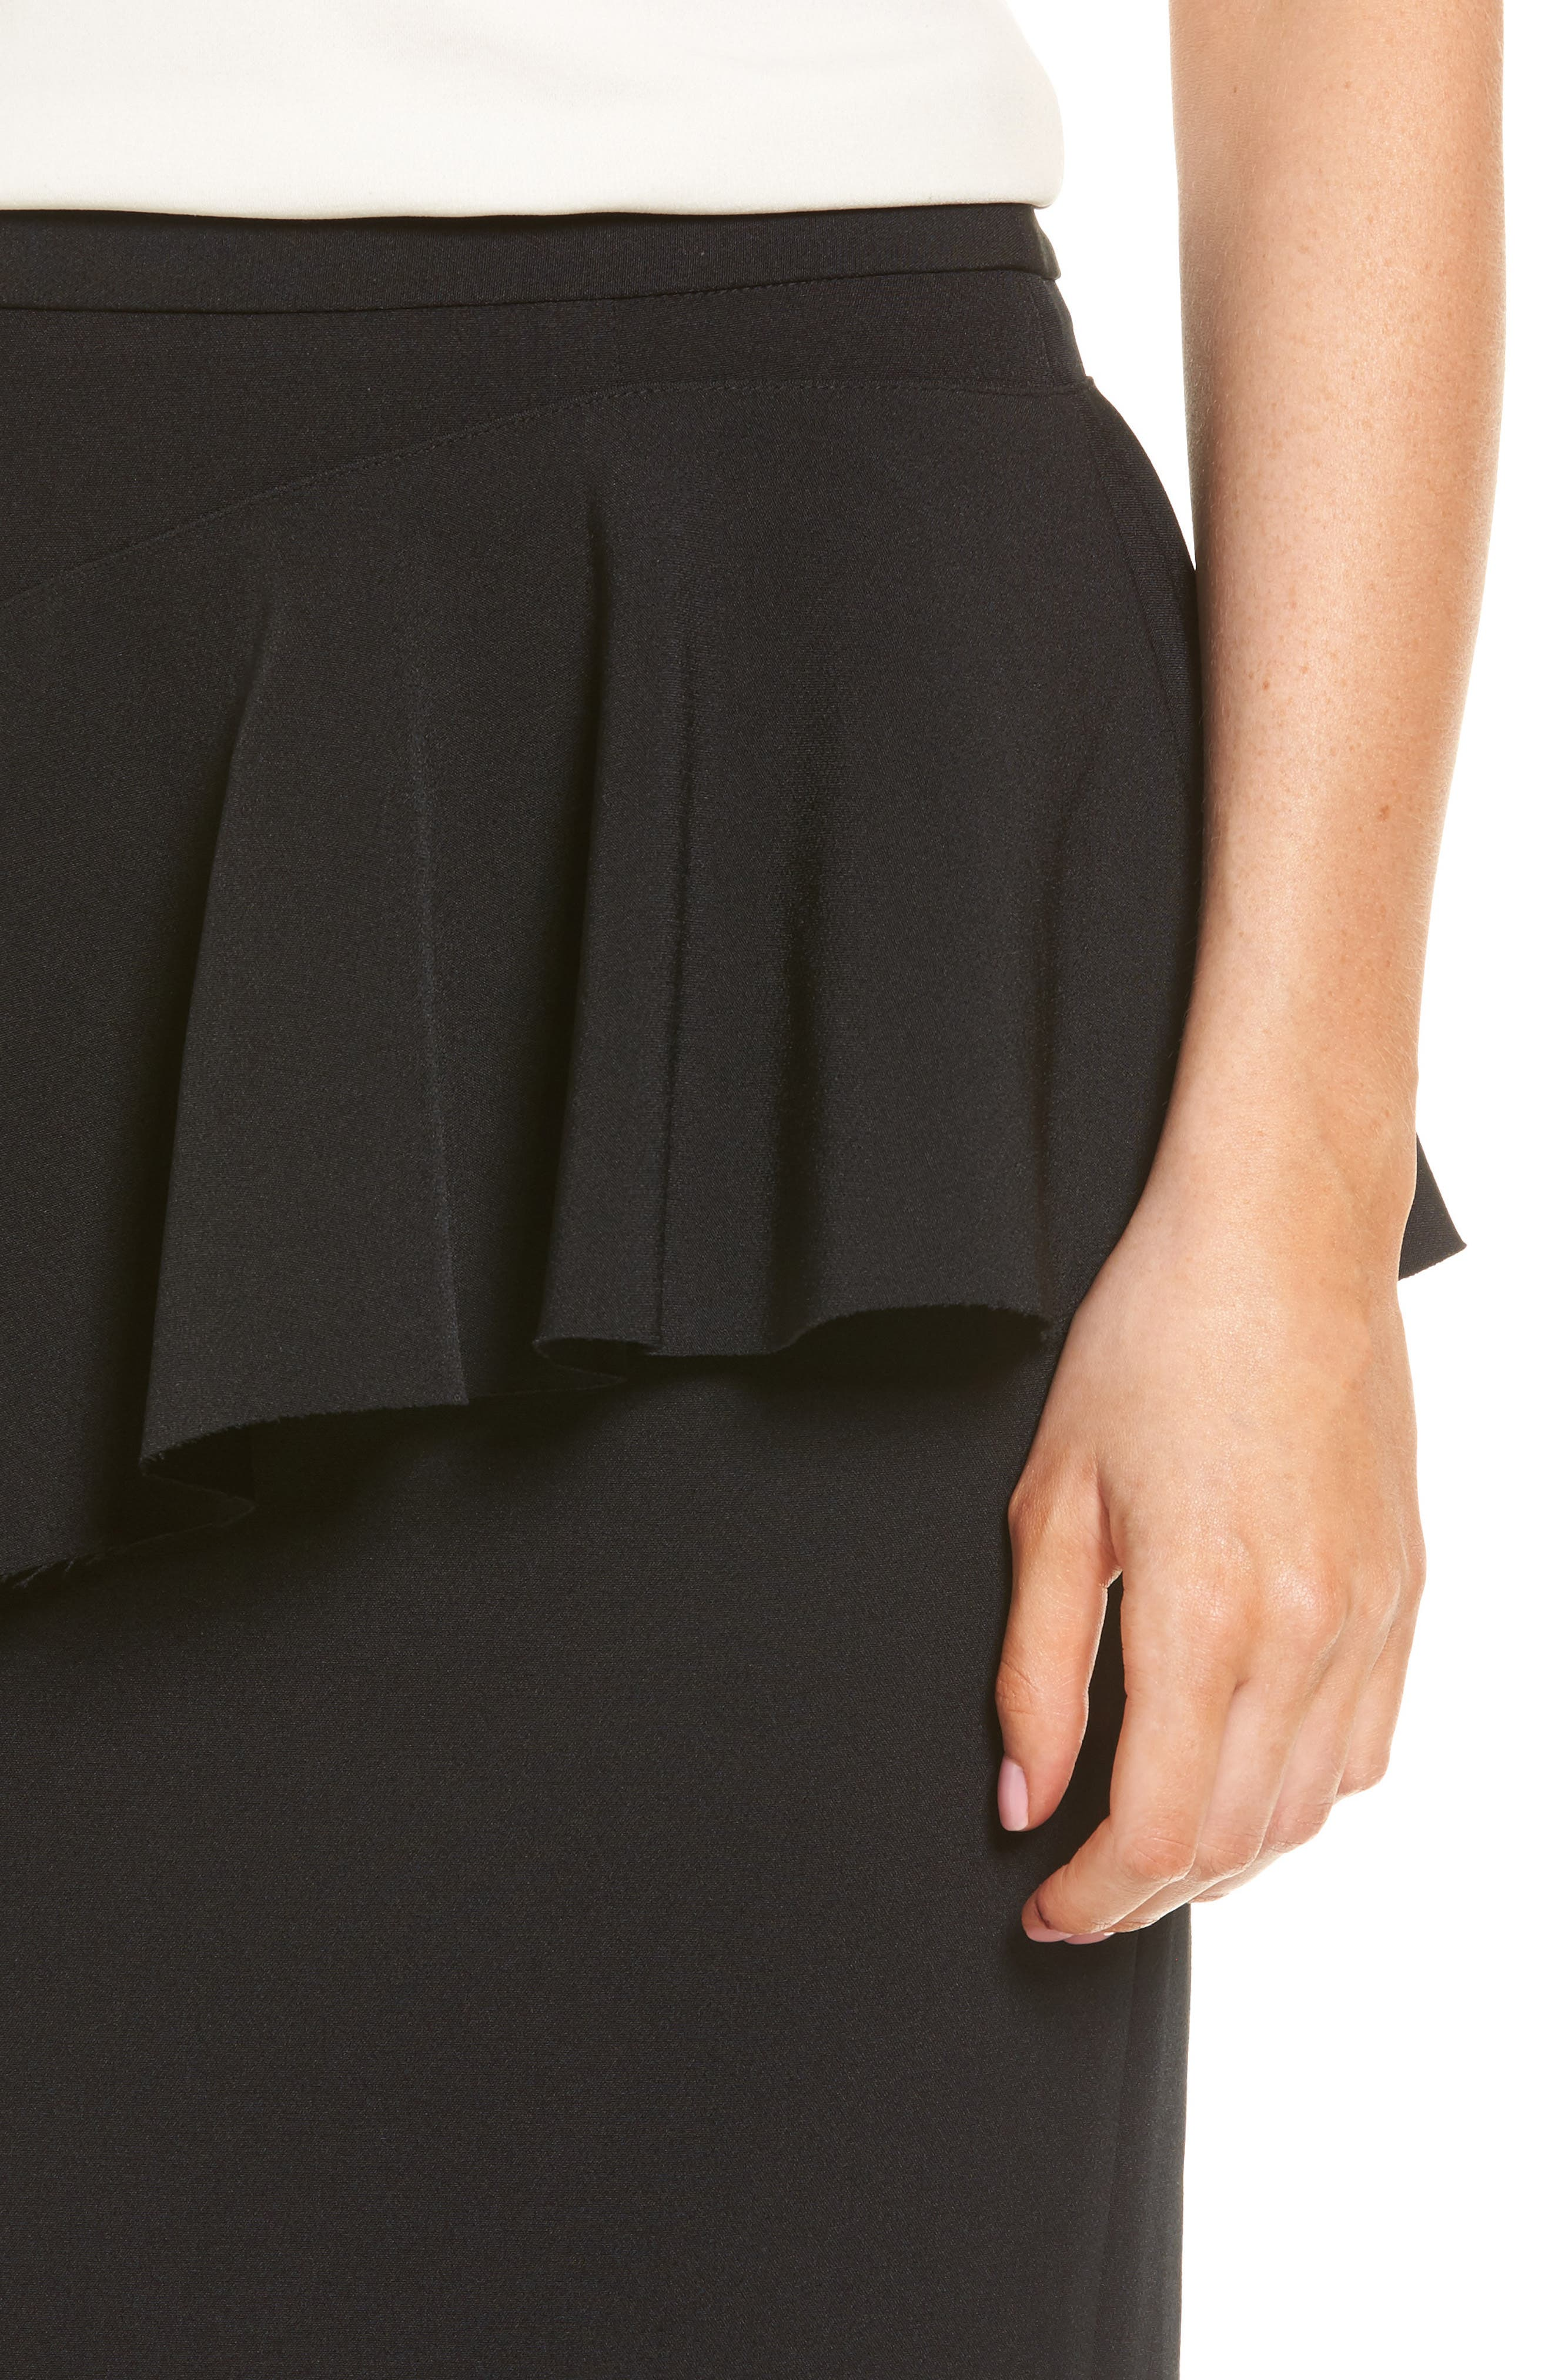 Ruffle Detail Pencil Skirt,                             Alternate thumbnail 4, color,                             001